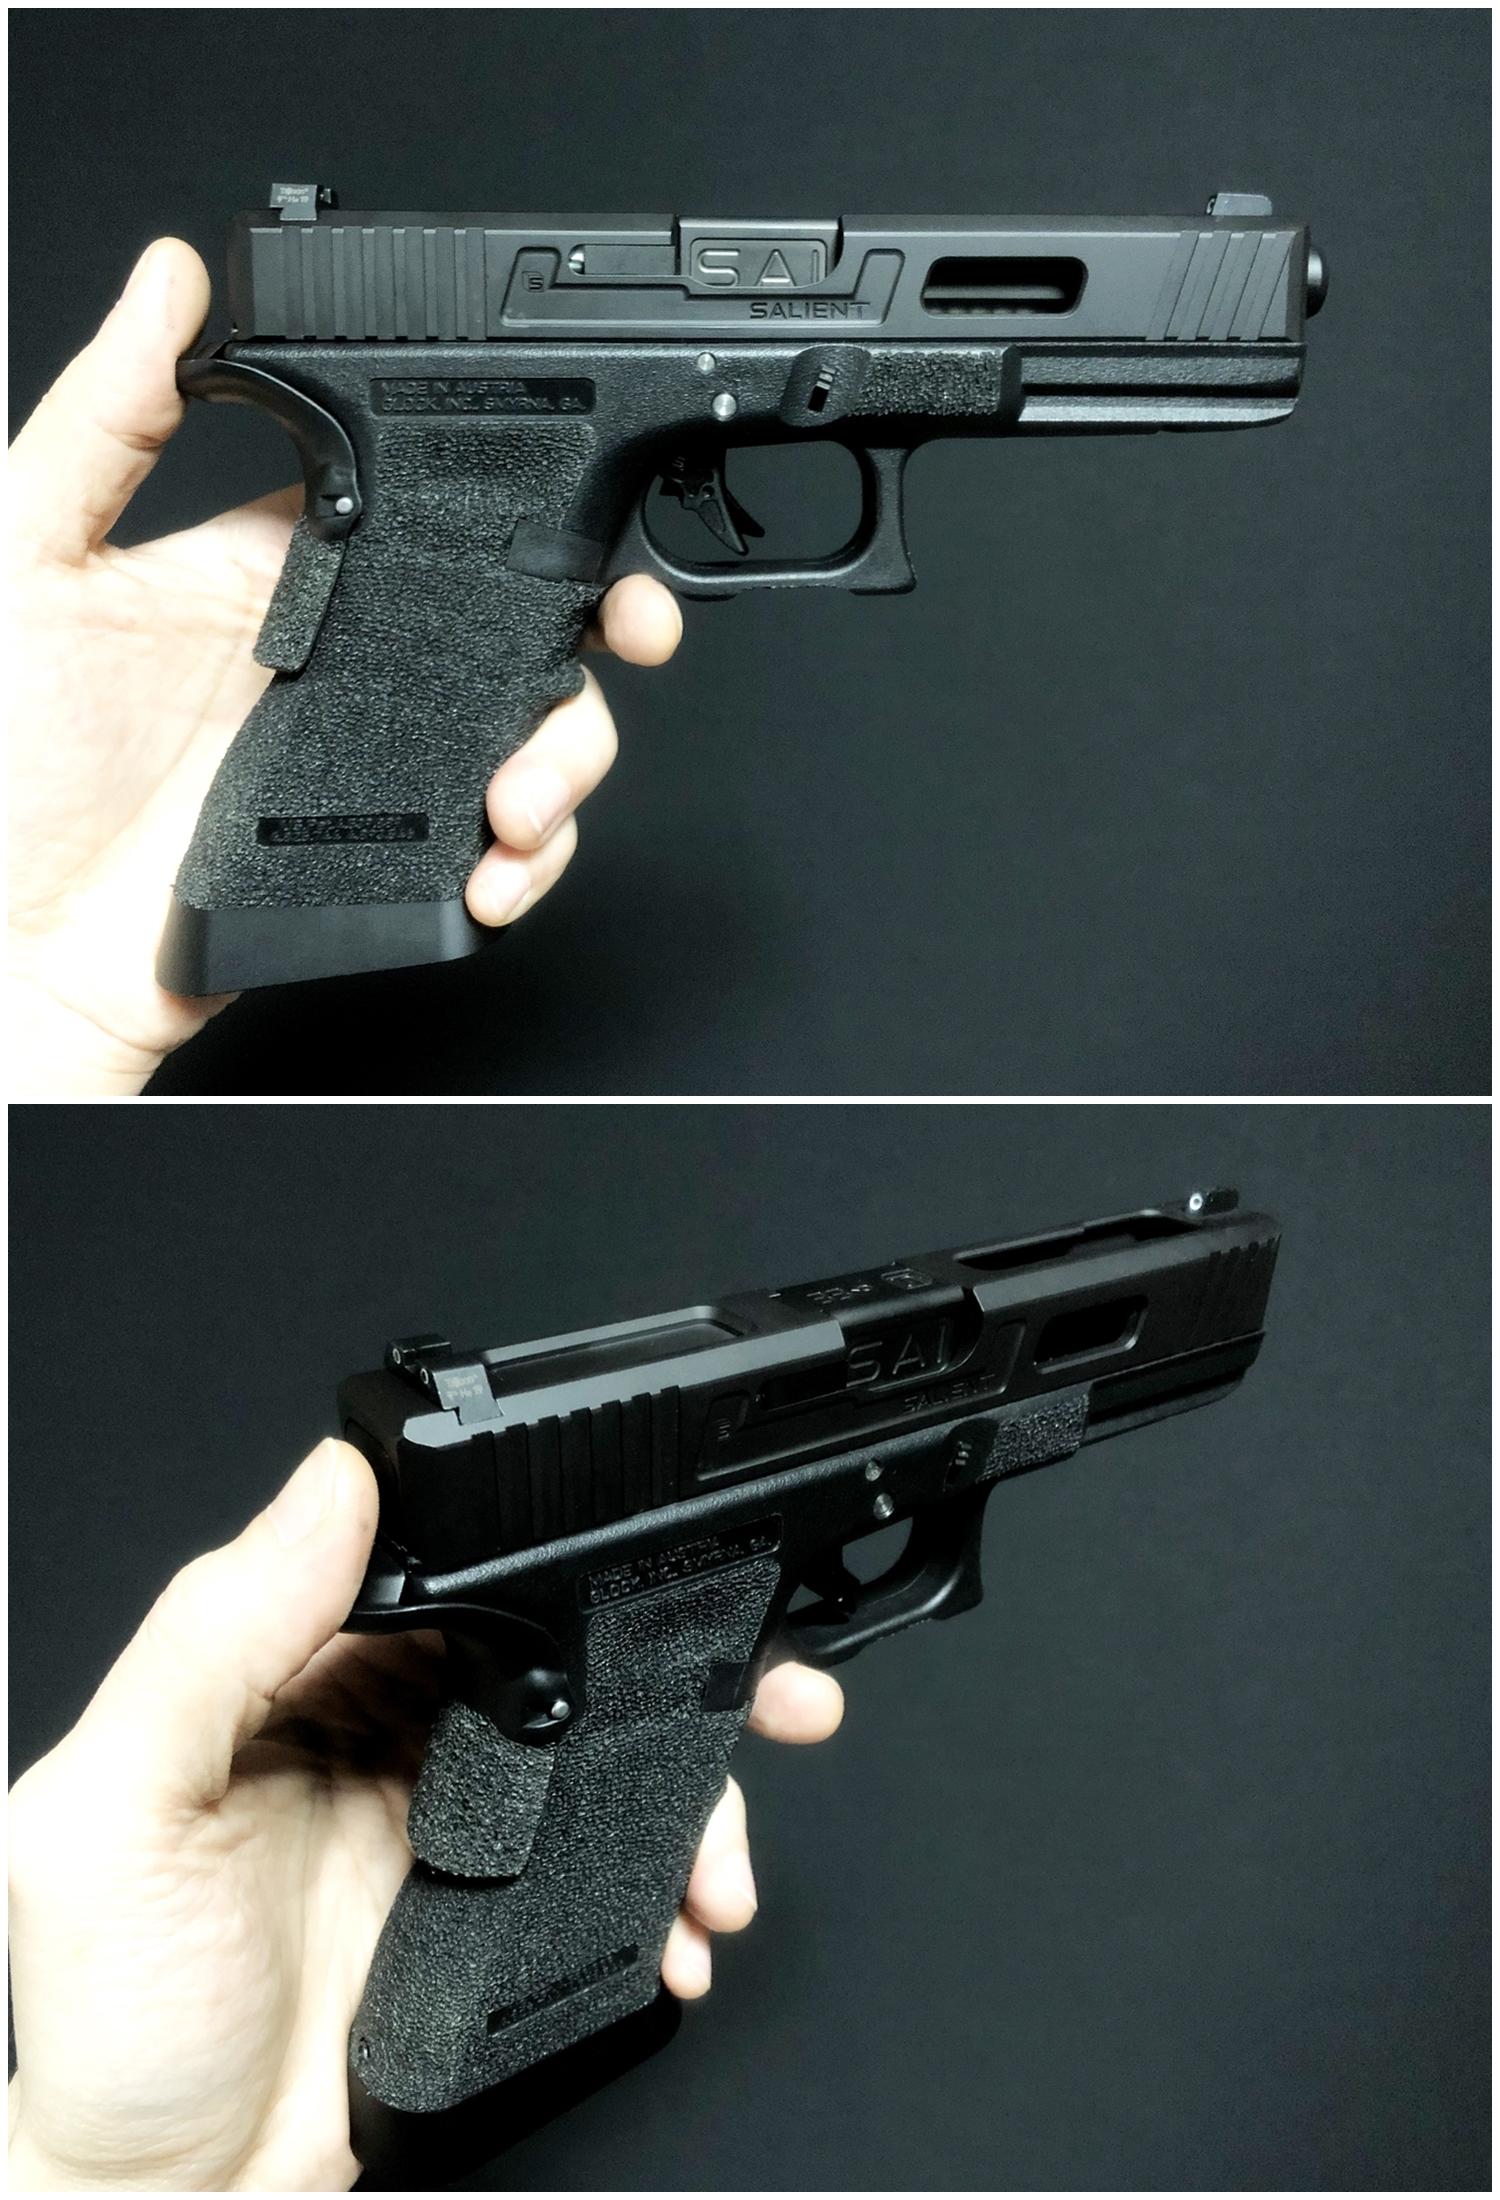 66 GLOCK Trijicon TRITIUM NIGHT SIGHTS HD HI LOW Guns Modify!! グロック トリジコン トリチウム サイト GET!! 購入 検証 取付 レビュー!! したるの巻!!